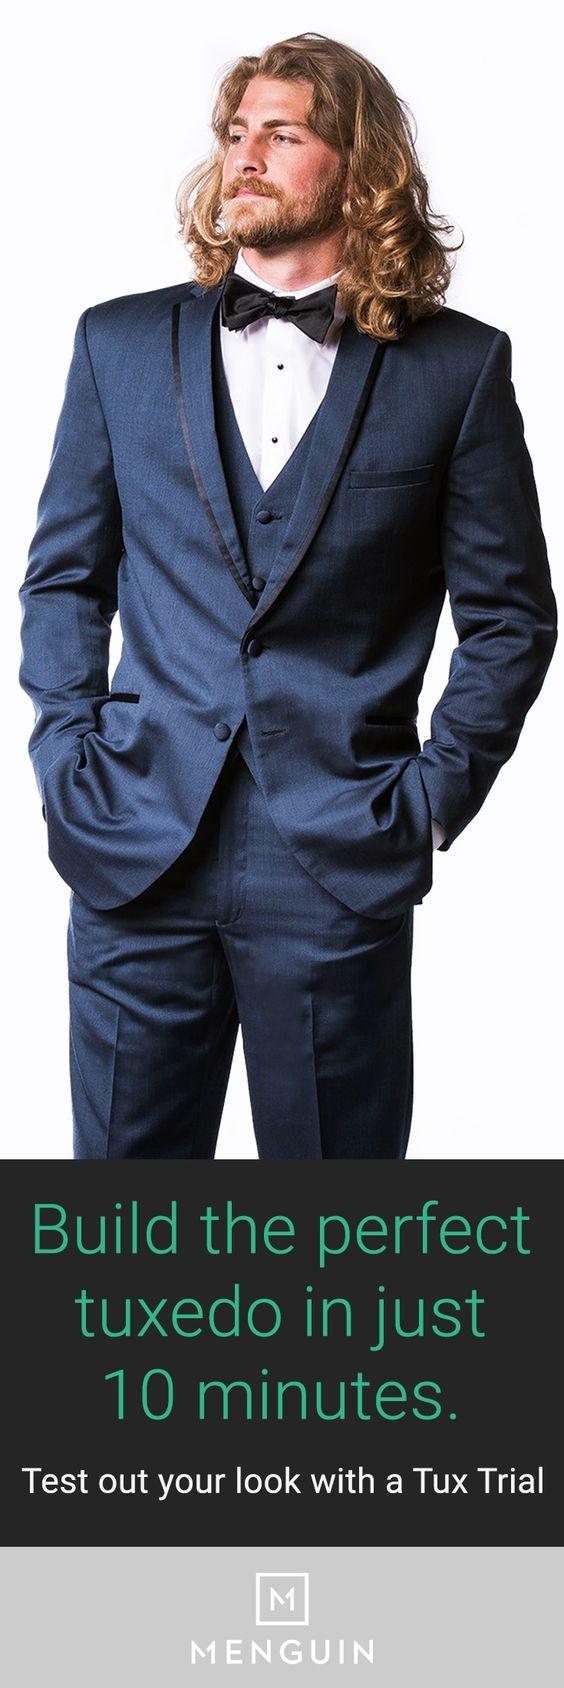 Wedding tux rentals right to your doorstep! Build & customize ...